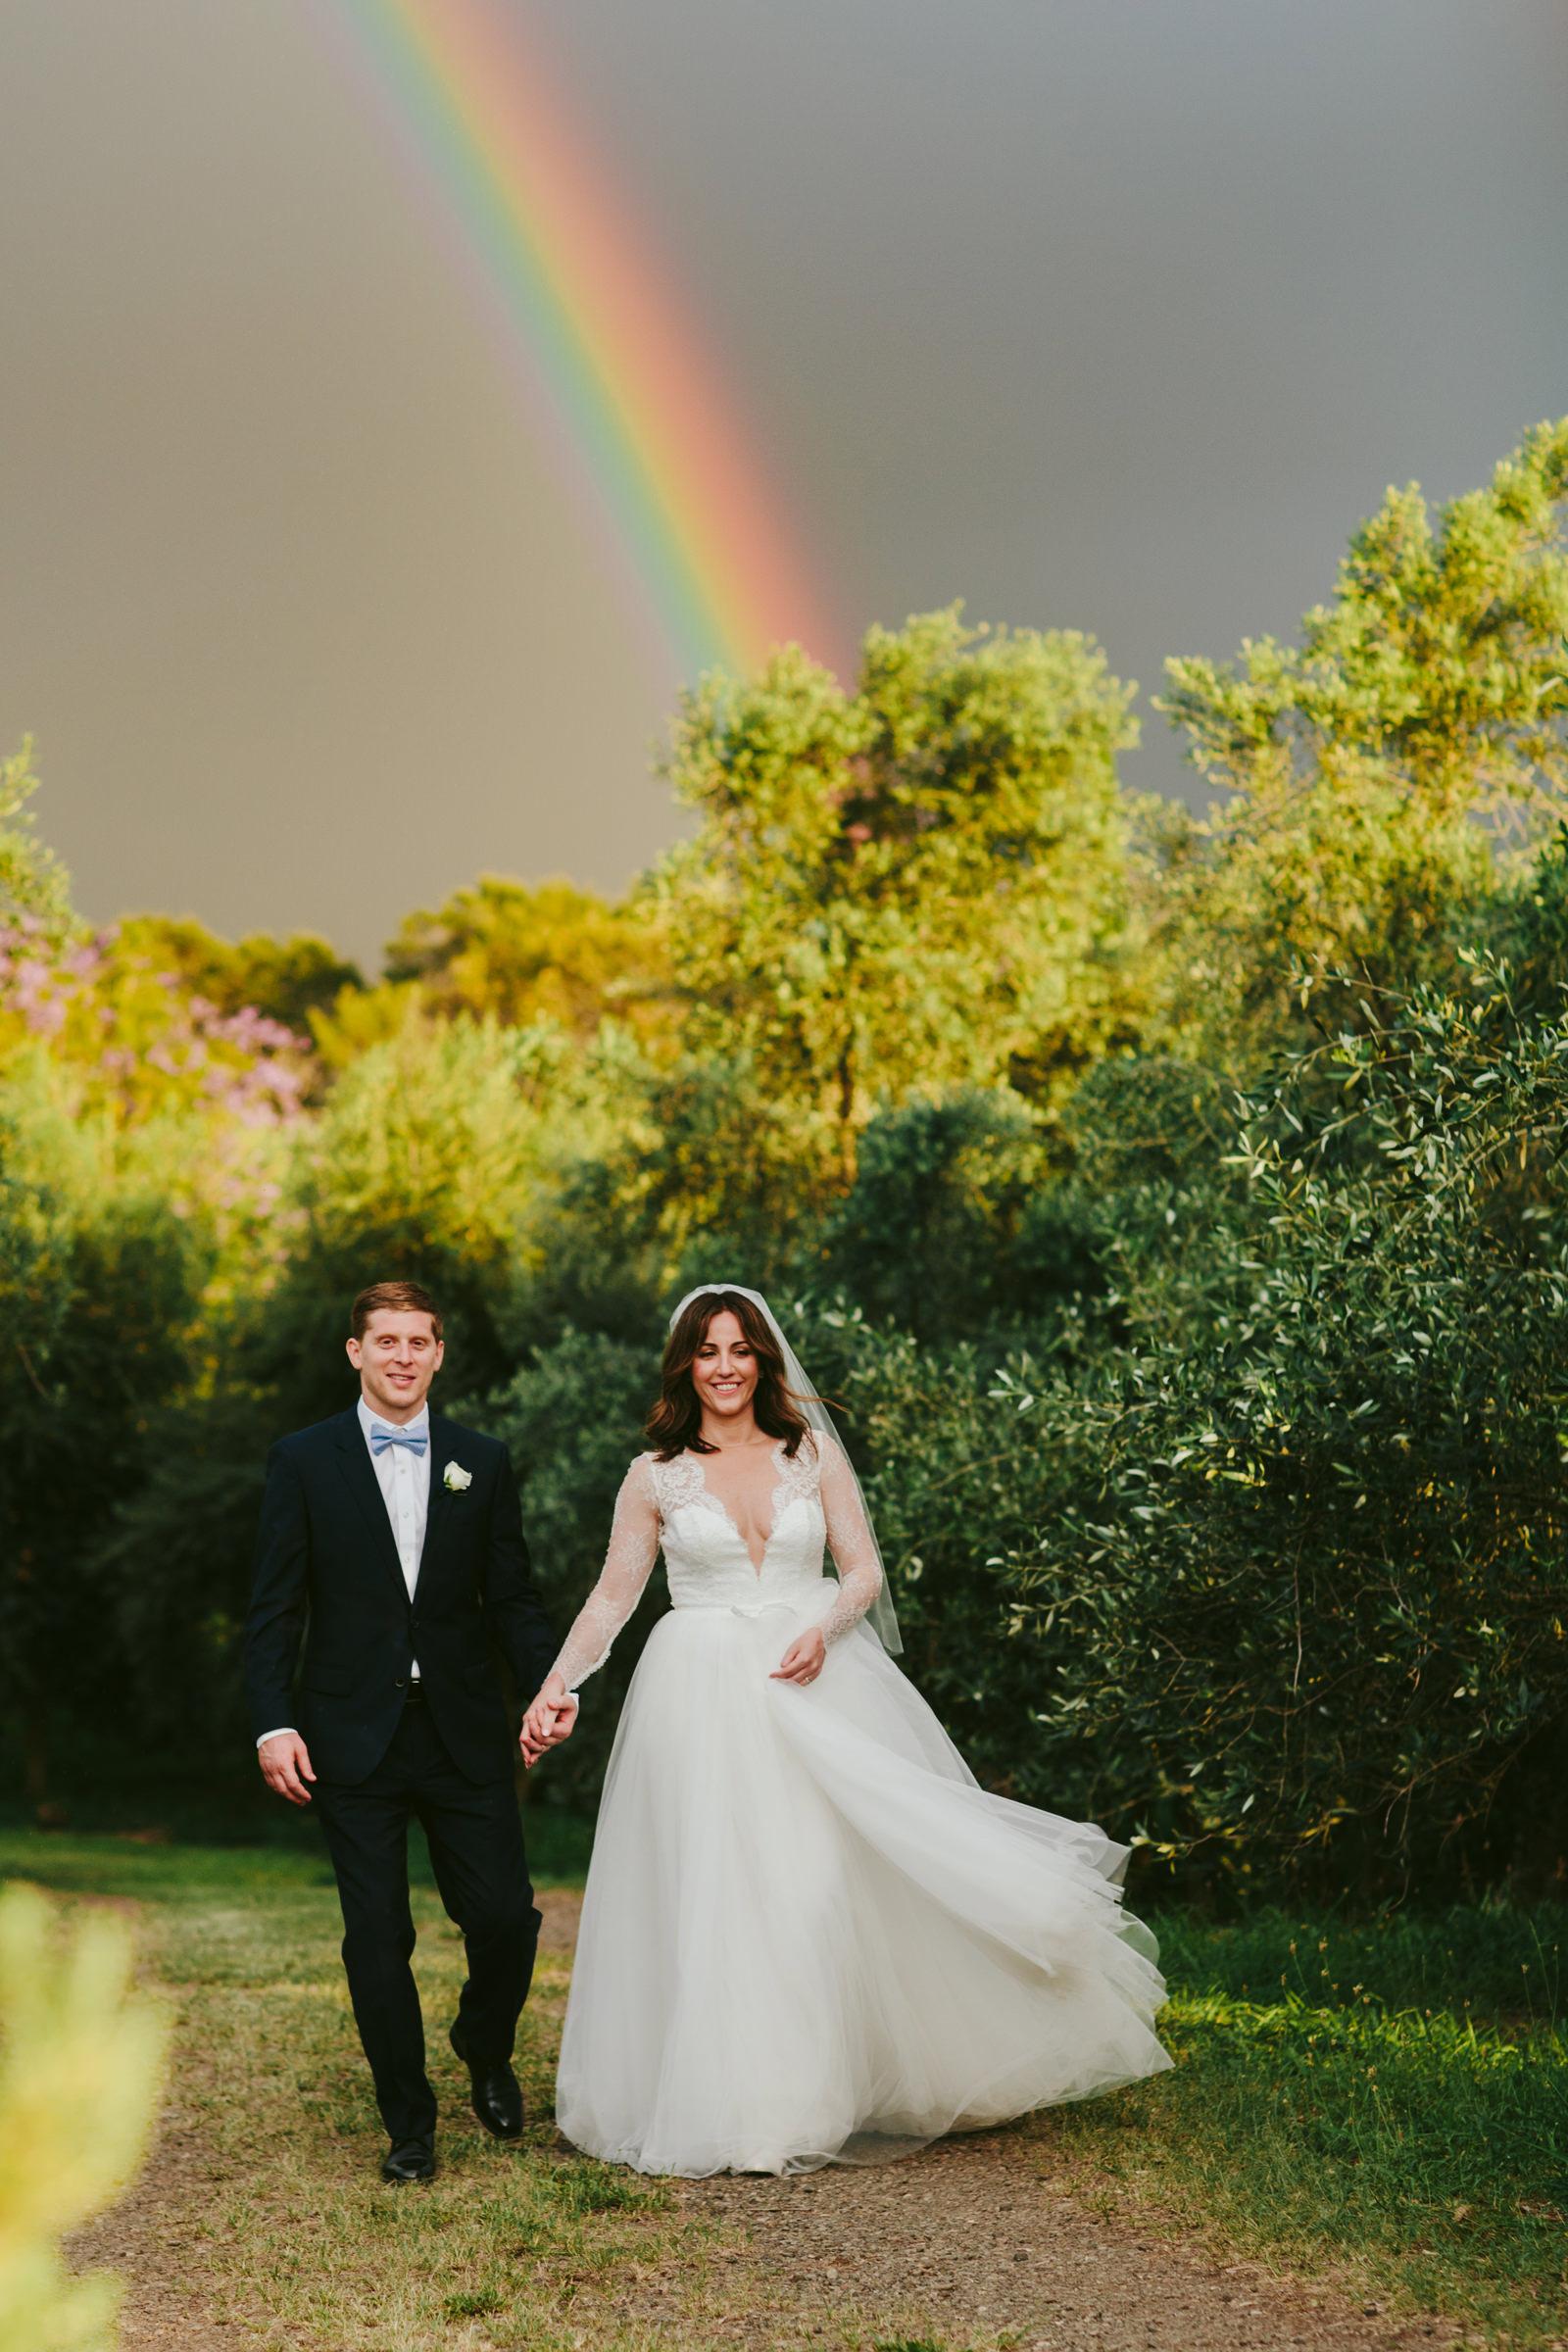 Calasa Olive Farm - portrait of couple with rainbow - photo by Melia Lucida